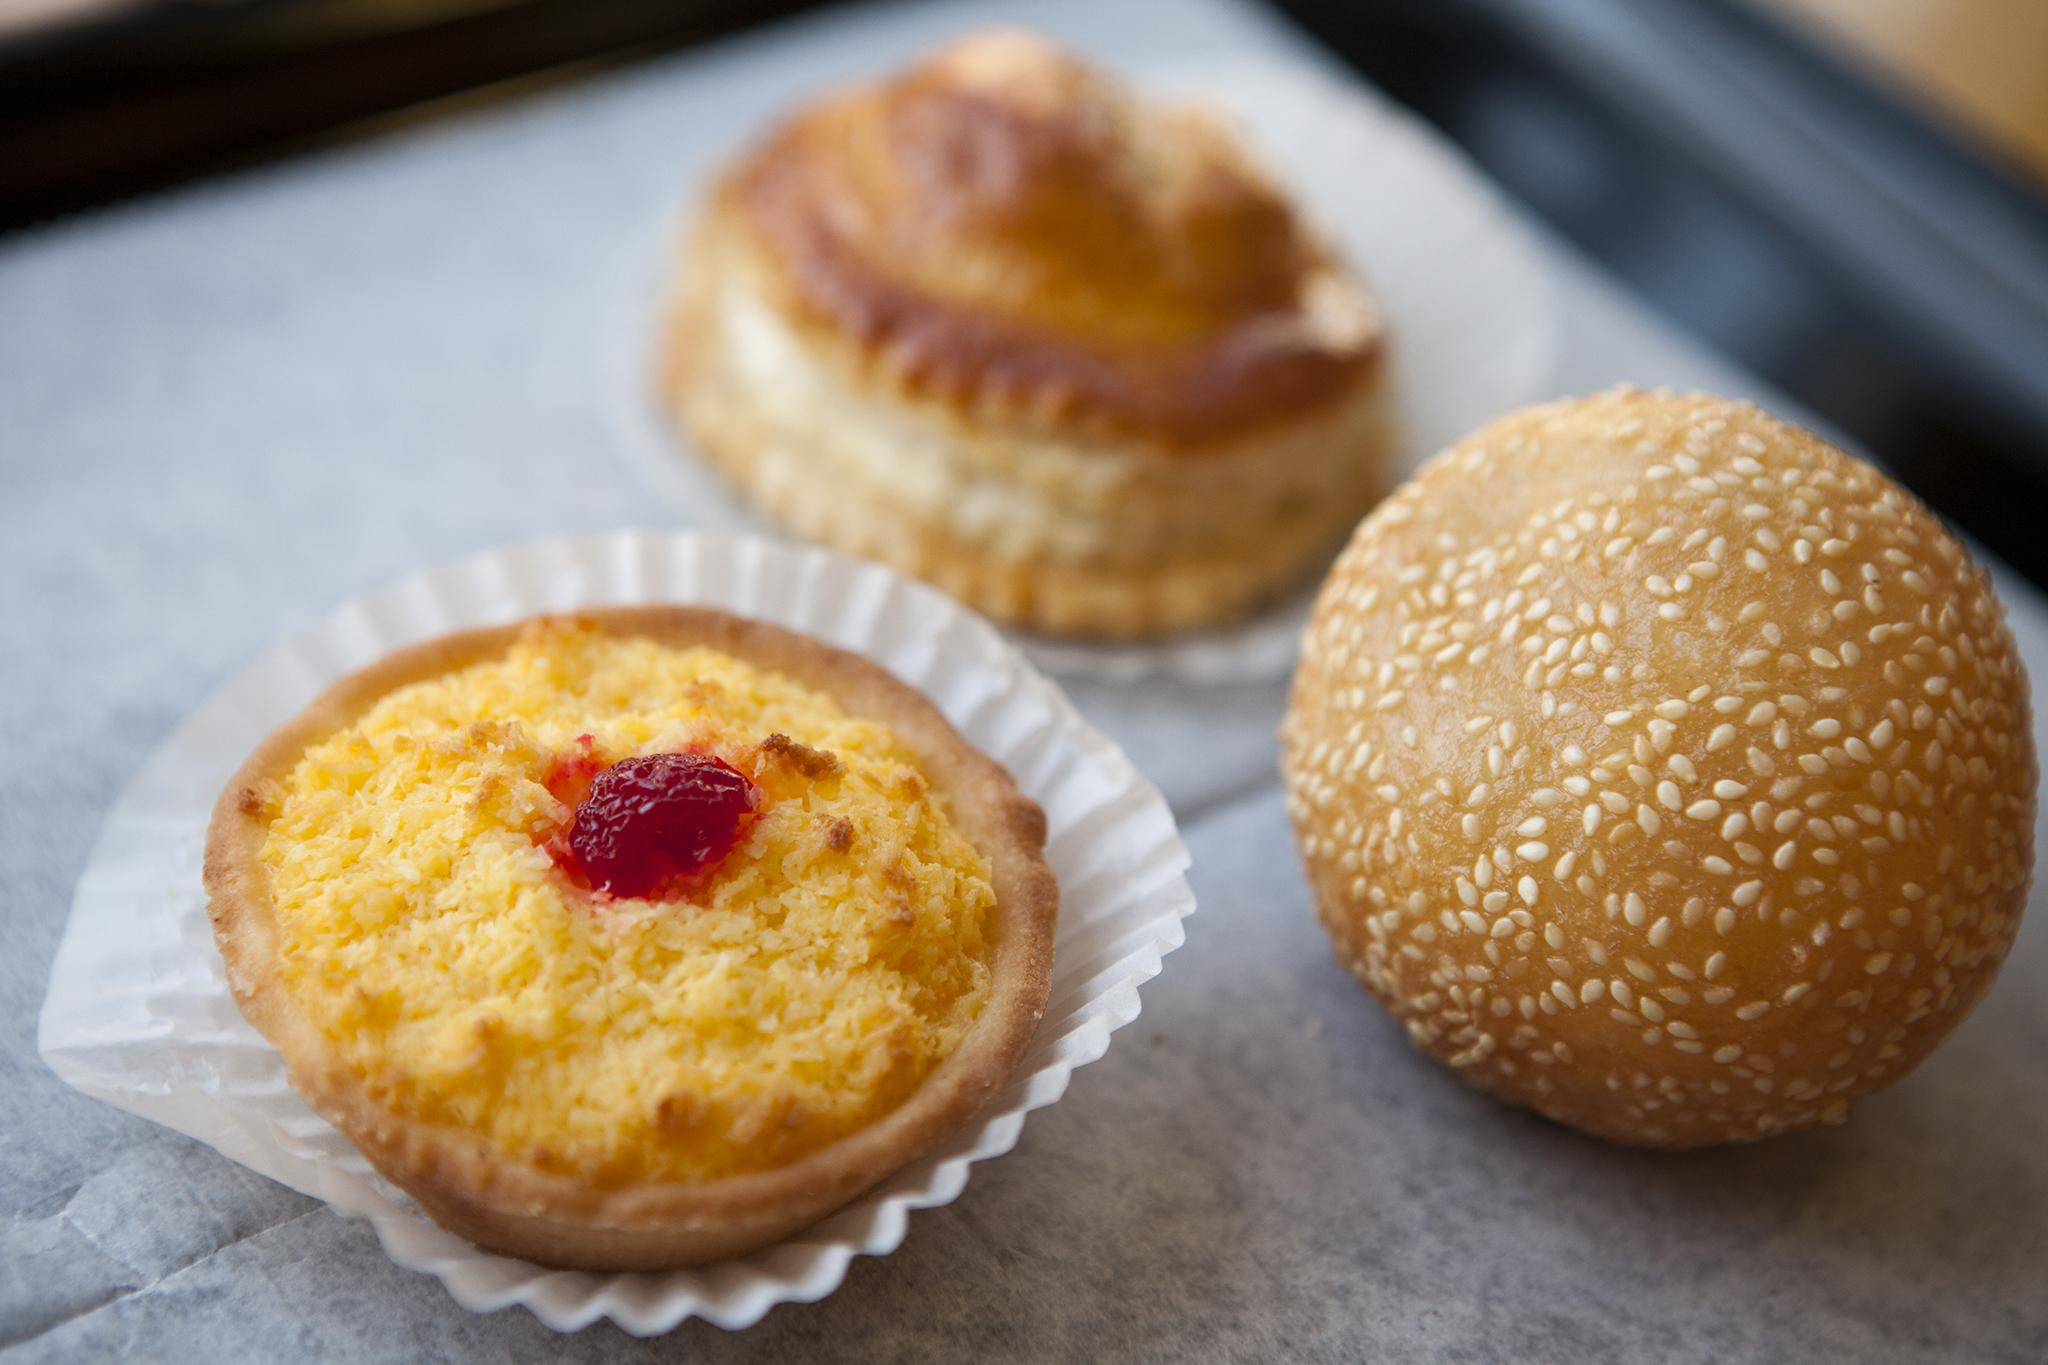 <p>Chinese pastries at Wonder Bakery</p>